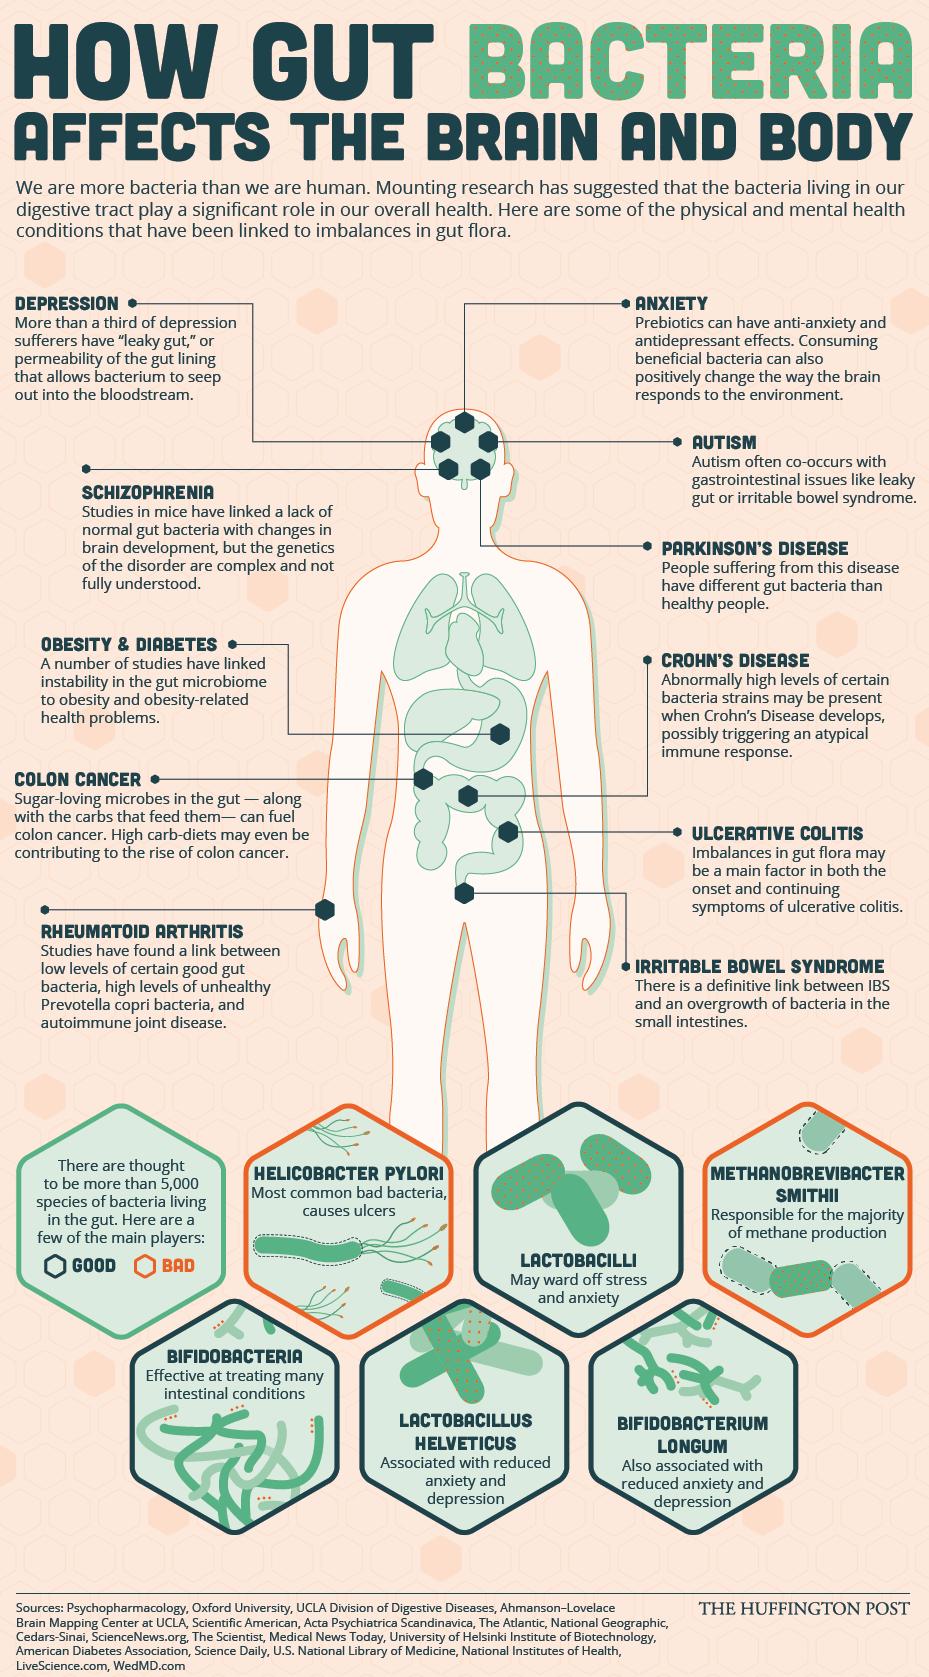 Watch Good Gut Health: The Beginners Guide video